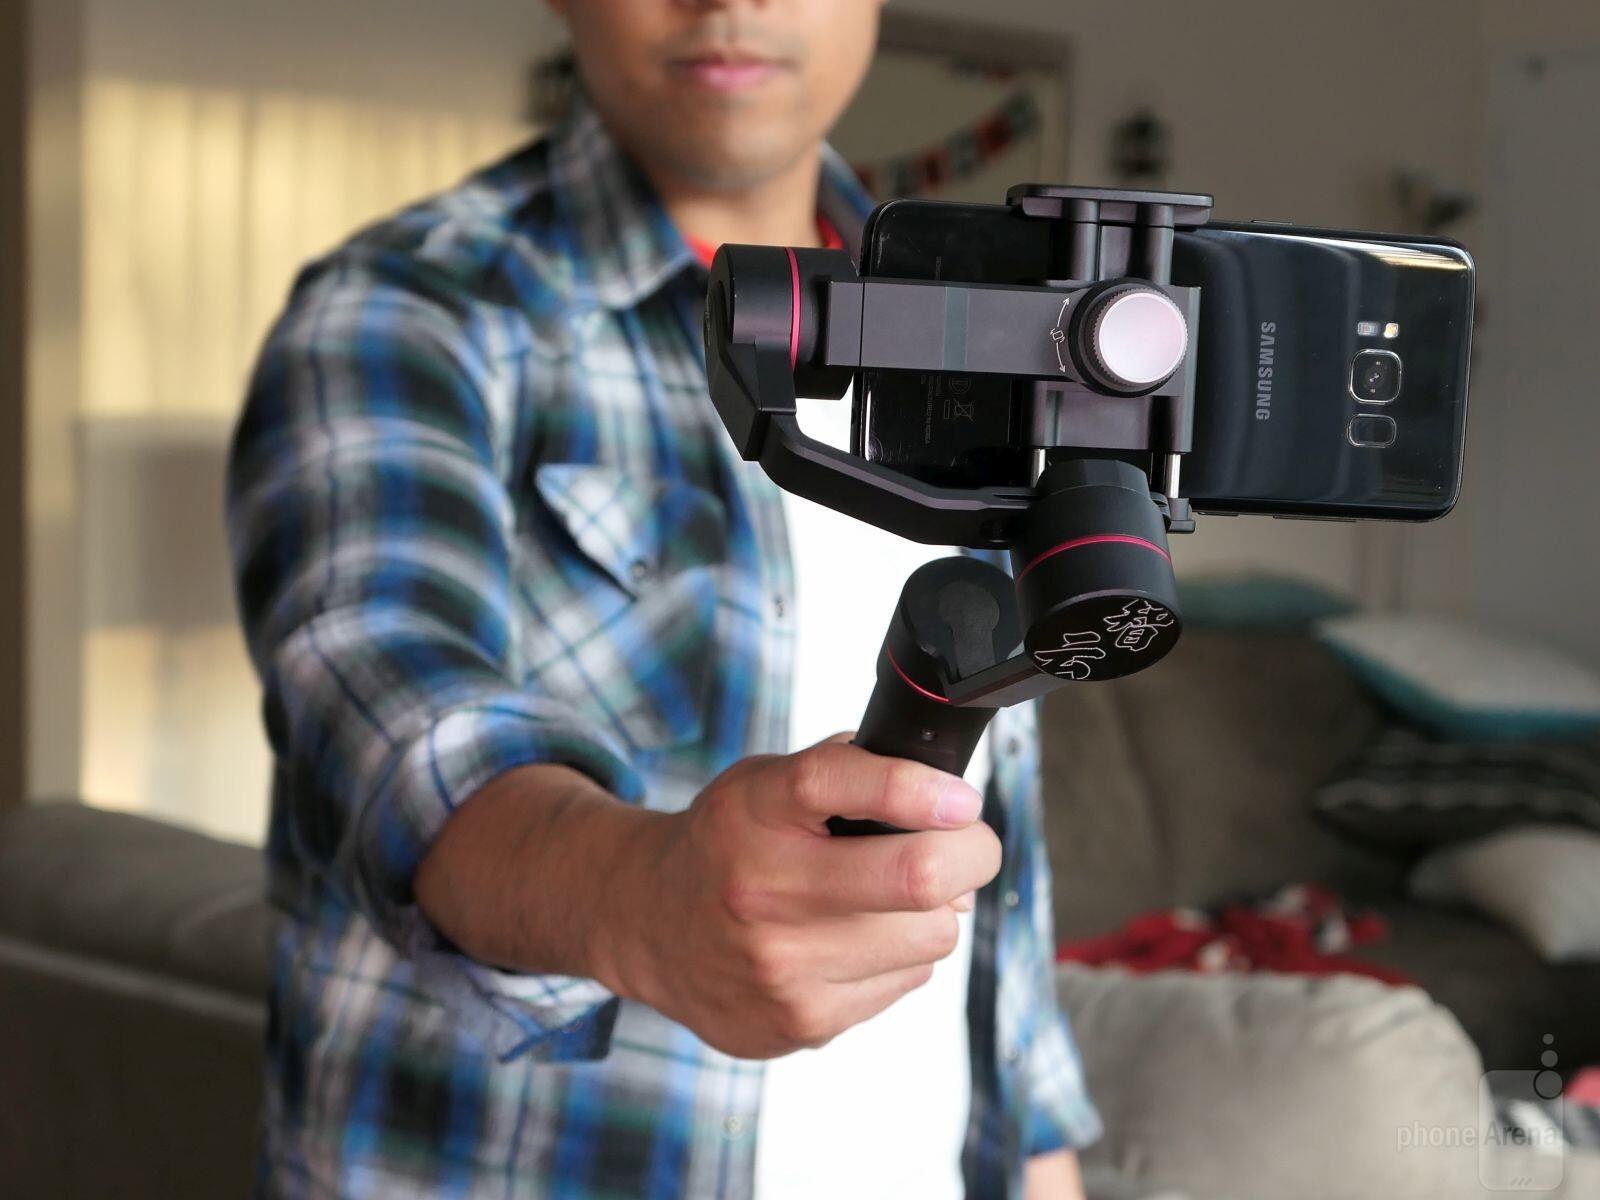 Dji Osmo Mobile Vs Feiyu Tech Spg Zhiyun Smooth 3 The Best Ii Axis Handheld Gimbal Stabilizer For Smartphones